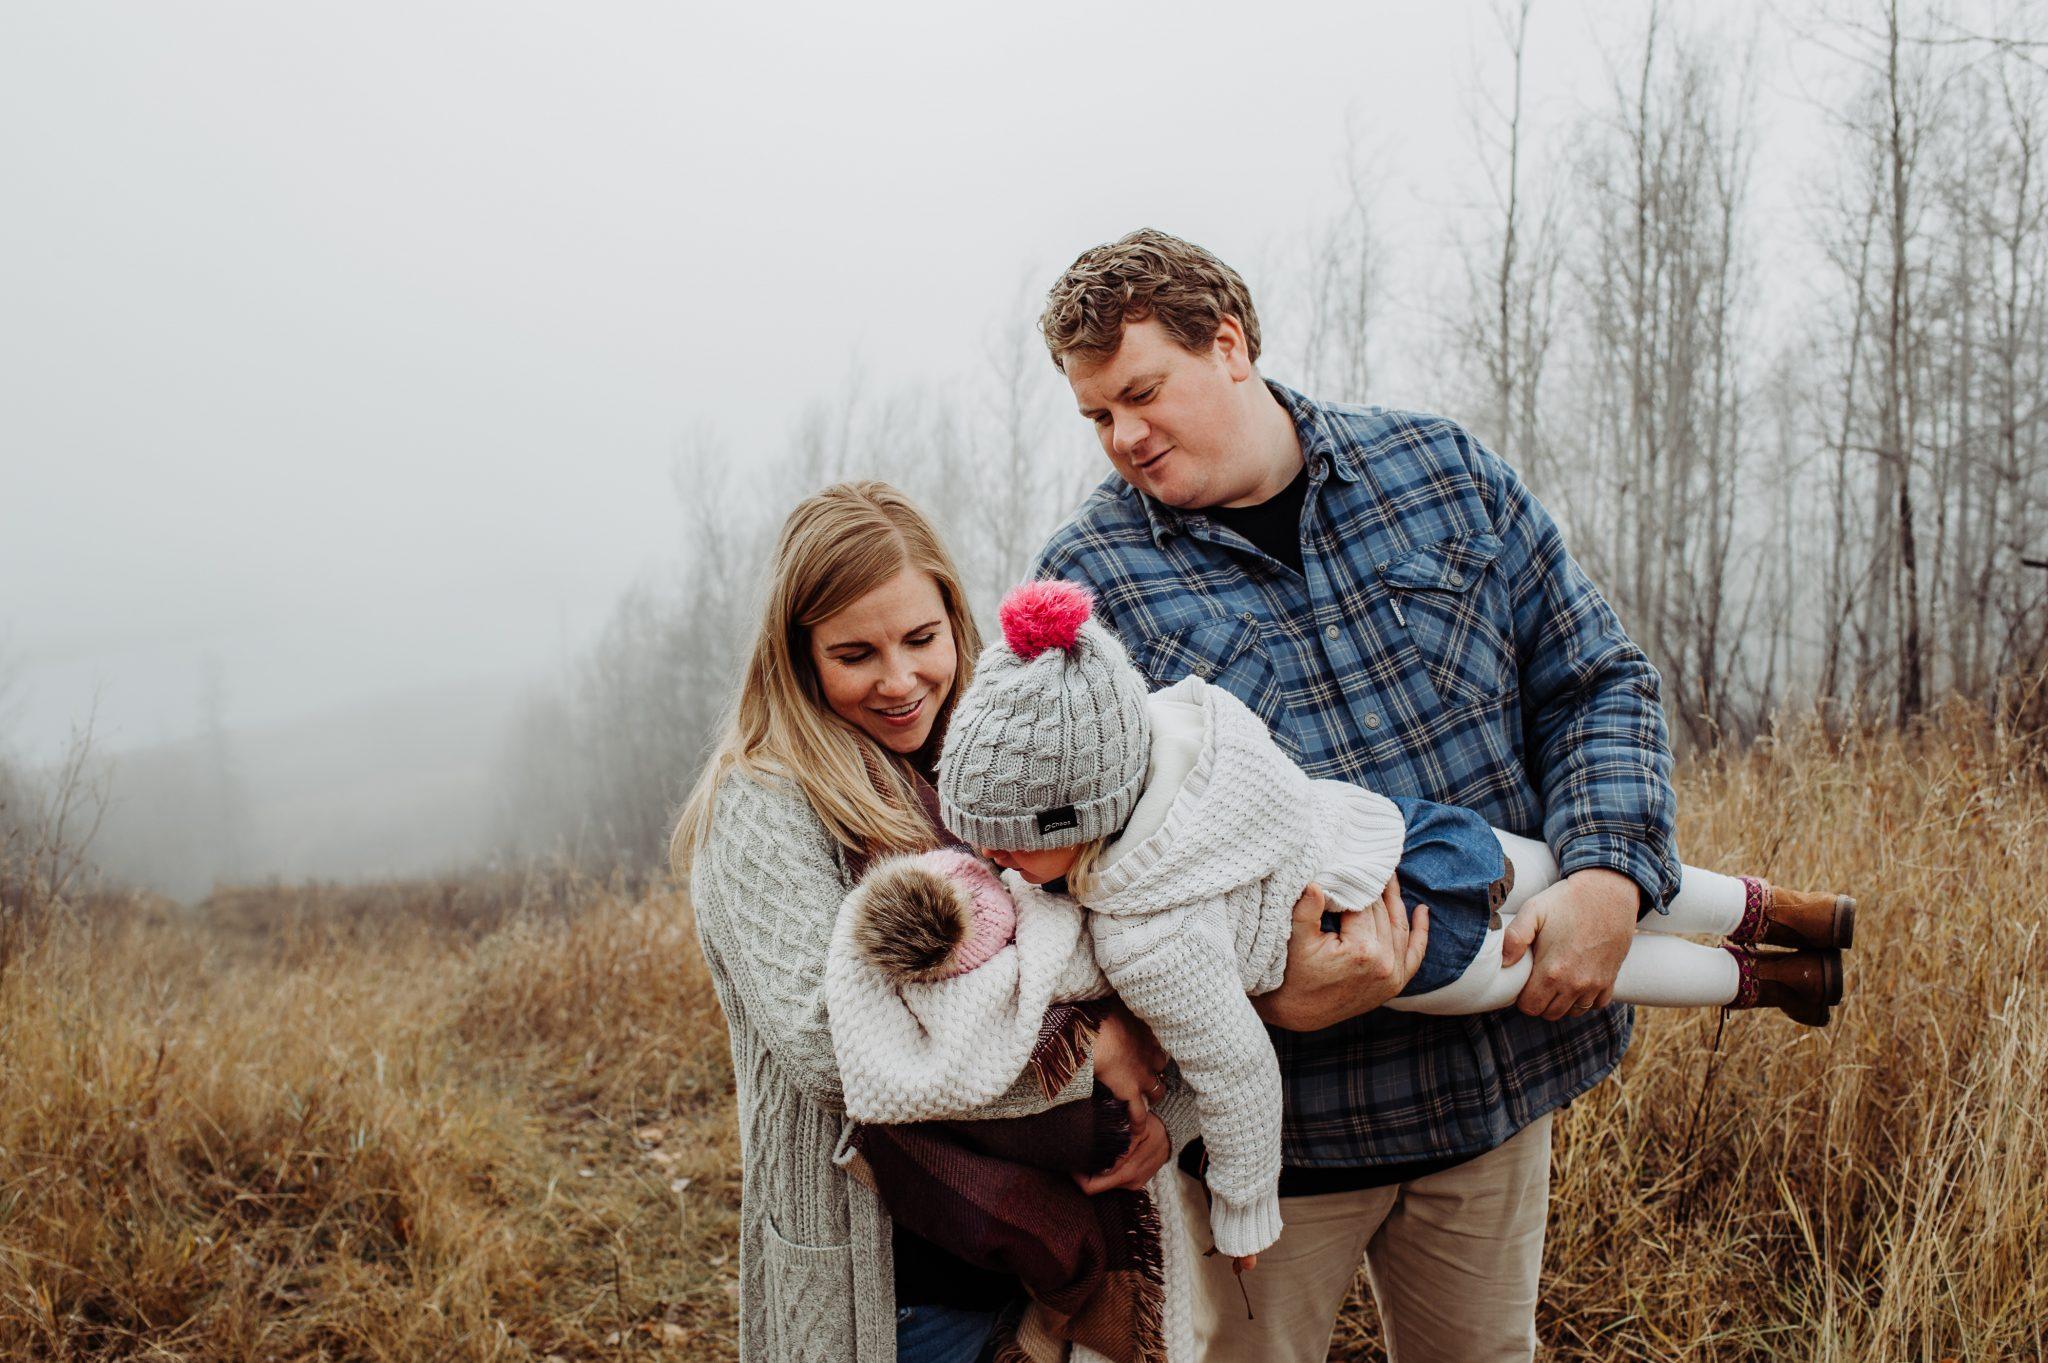 Baby Benner {Newborn Lifestyle}-Fort McMurray, AB